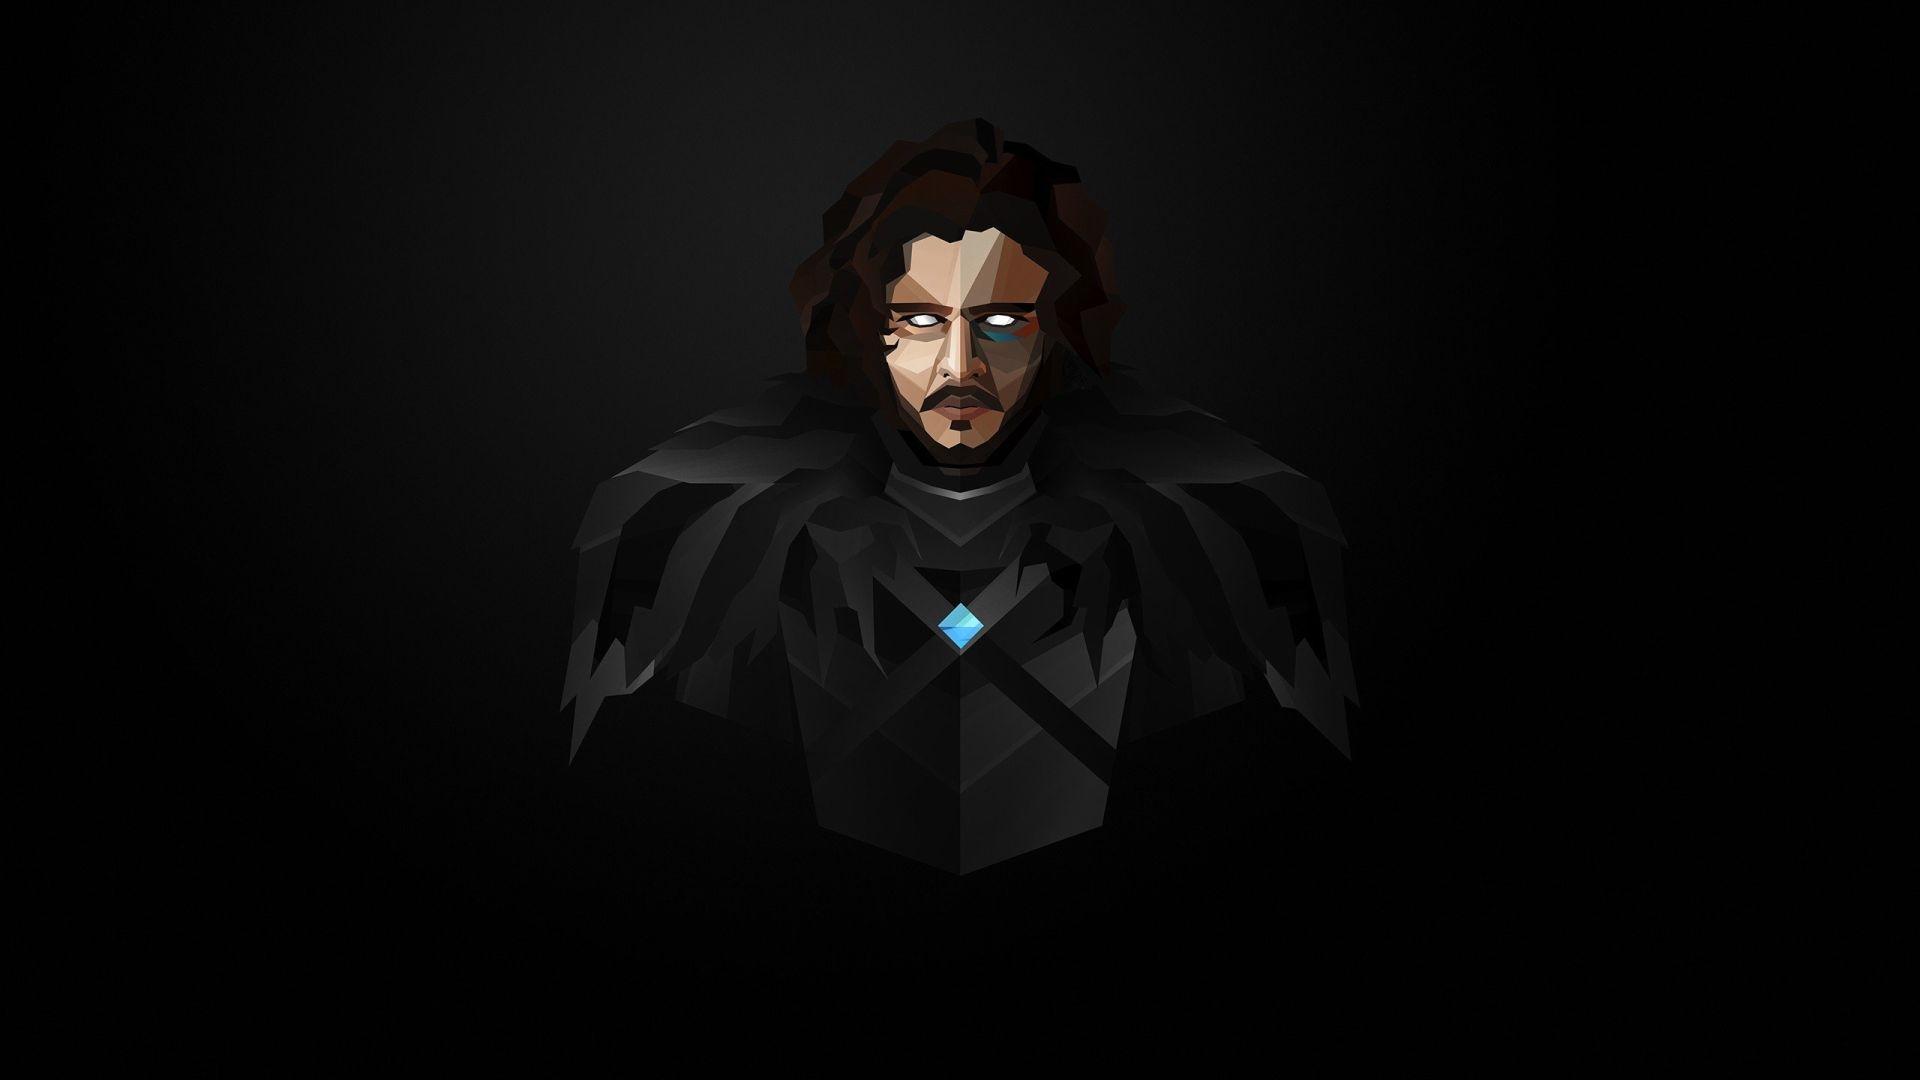 Game of Thrones Jon Snow dark